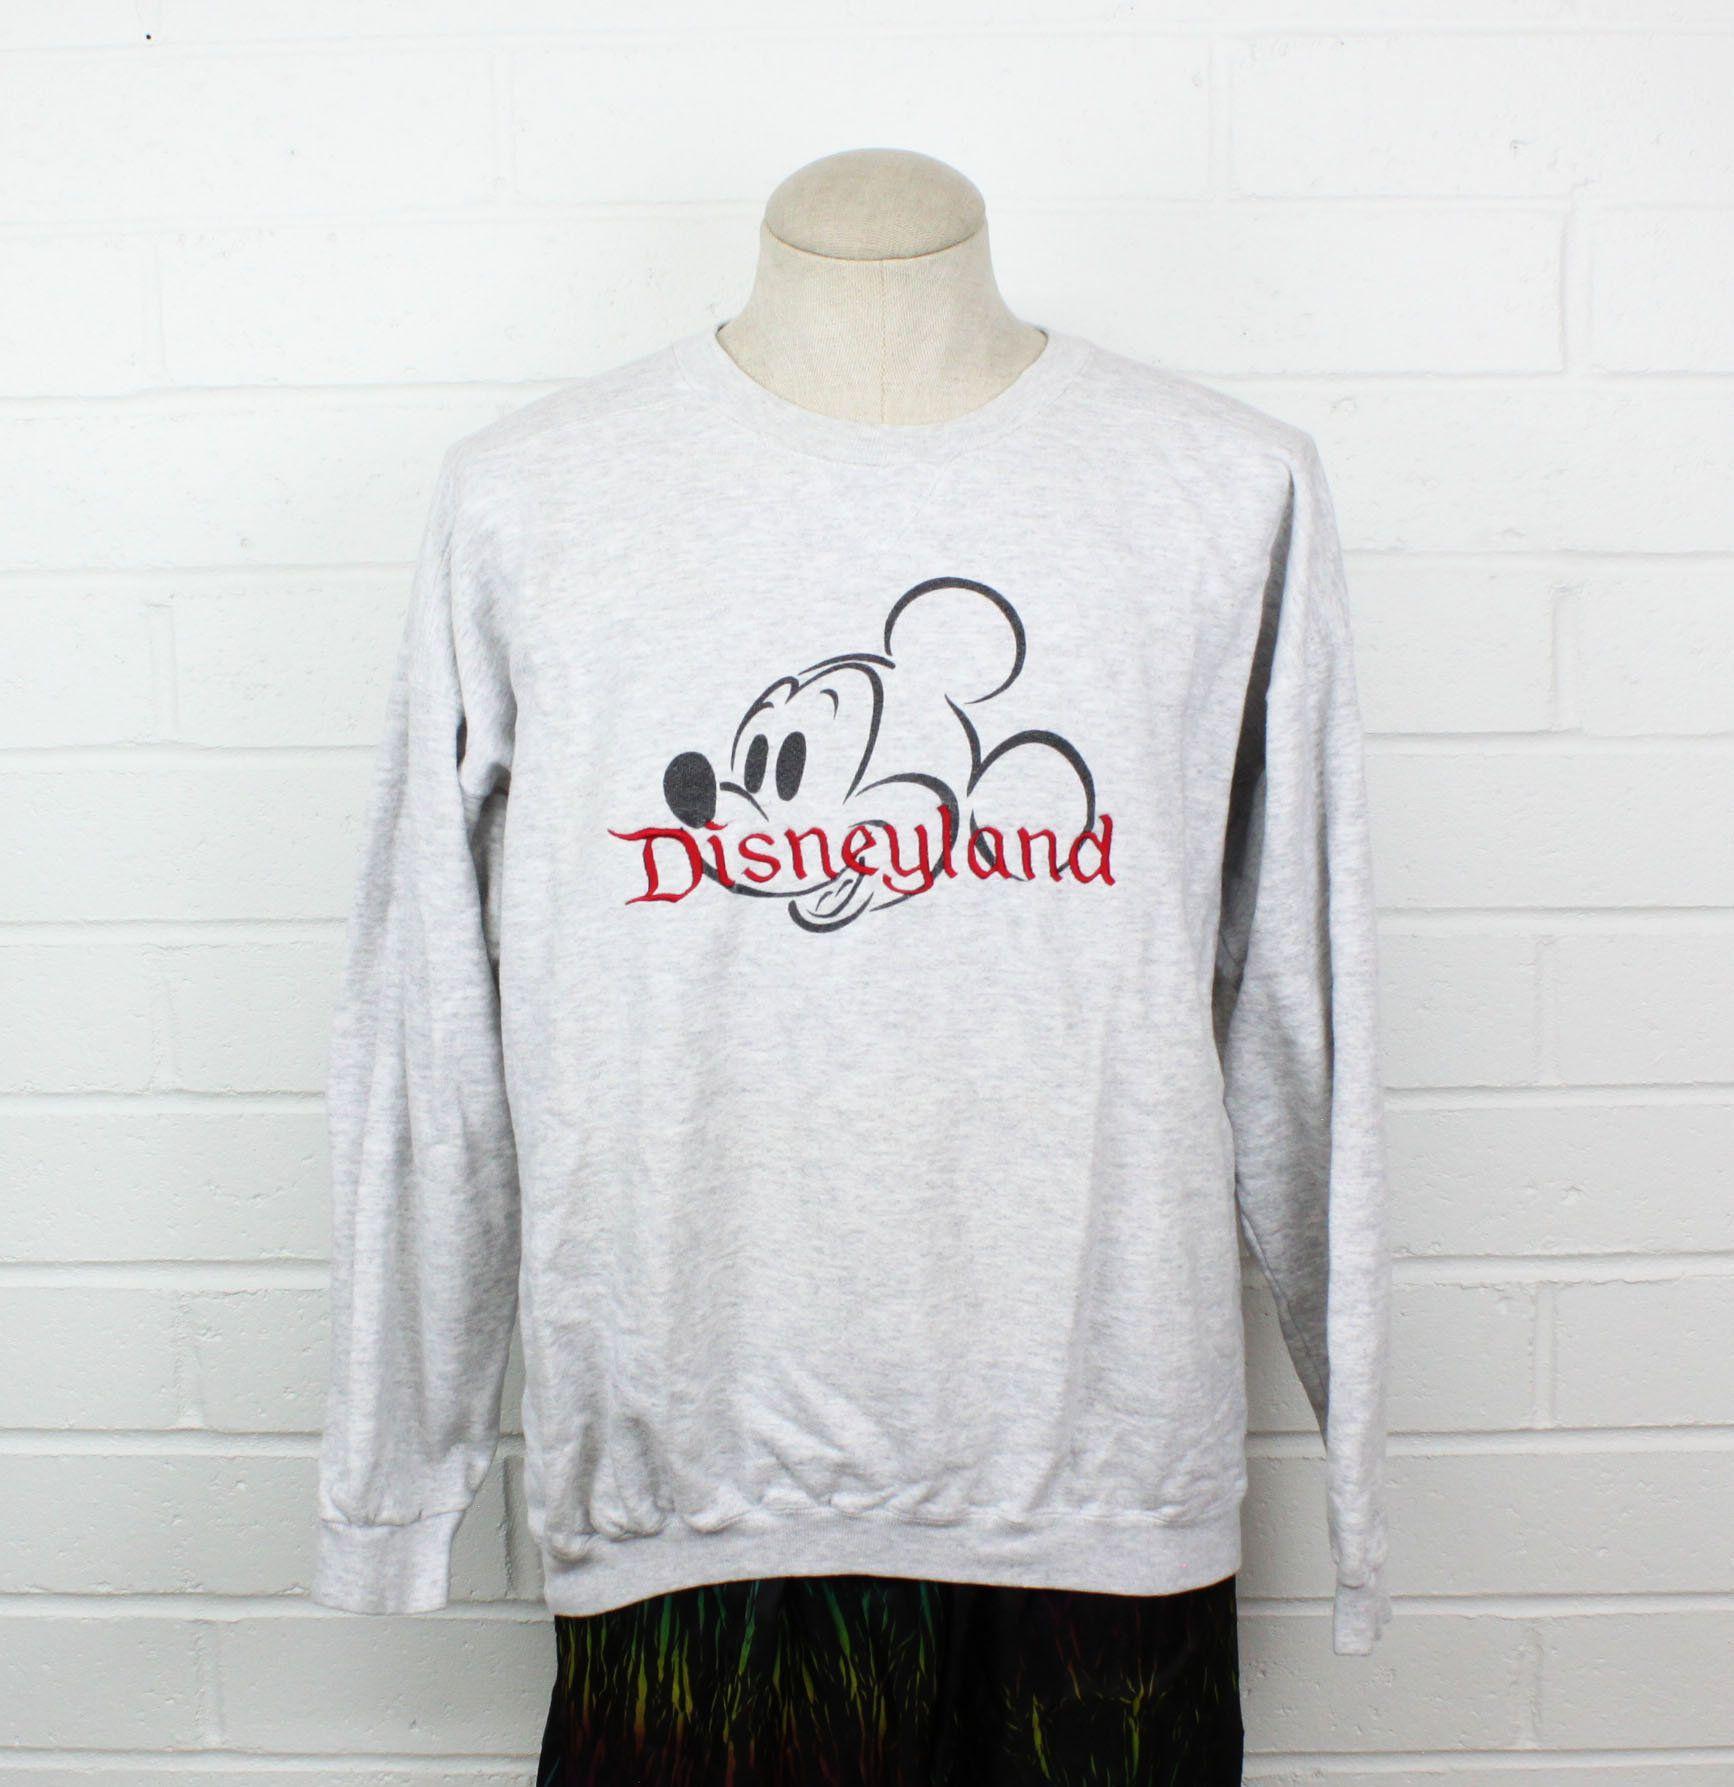 Vintage 90s Disneyland Mickey Mouse Sweatshirt Medium Baggy